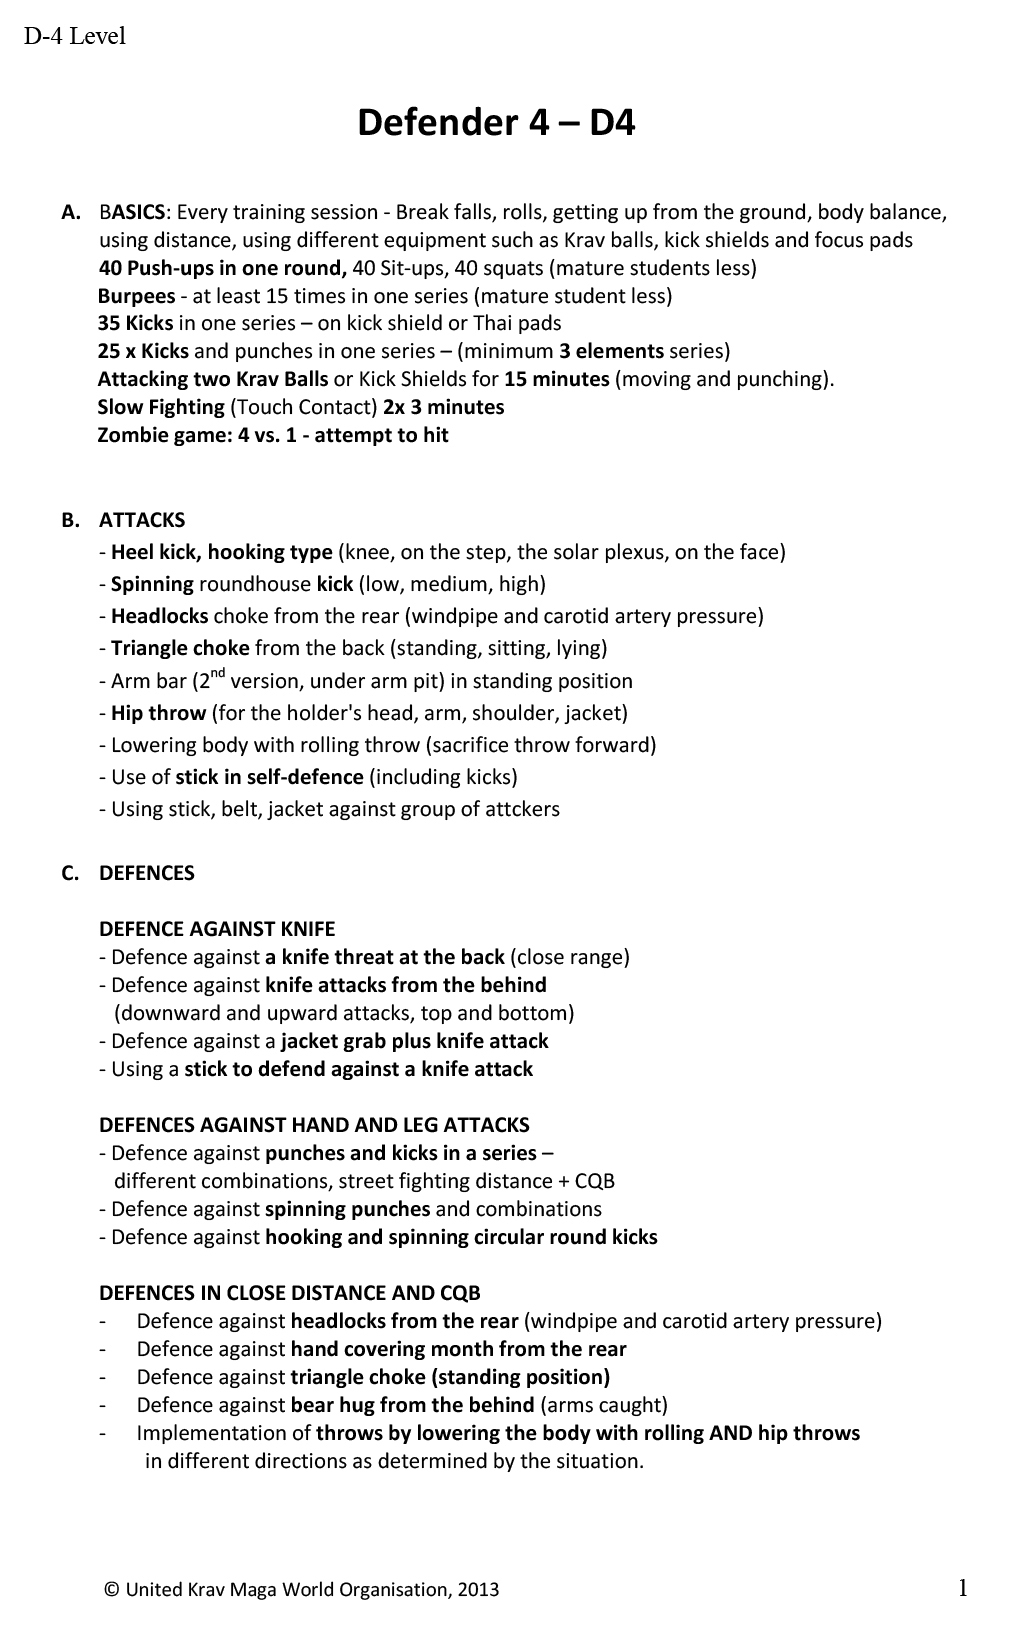 D4_ENGLISH.pdf-1.jpg